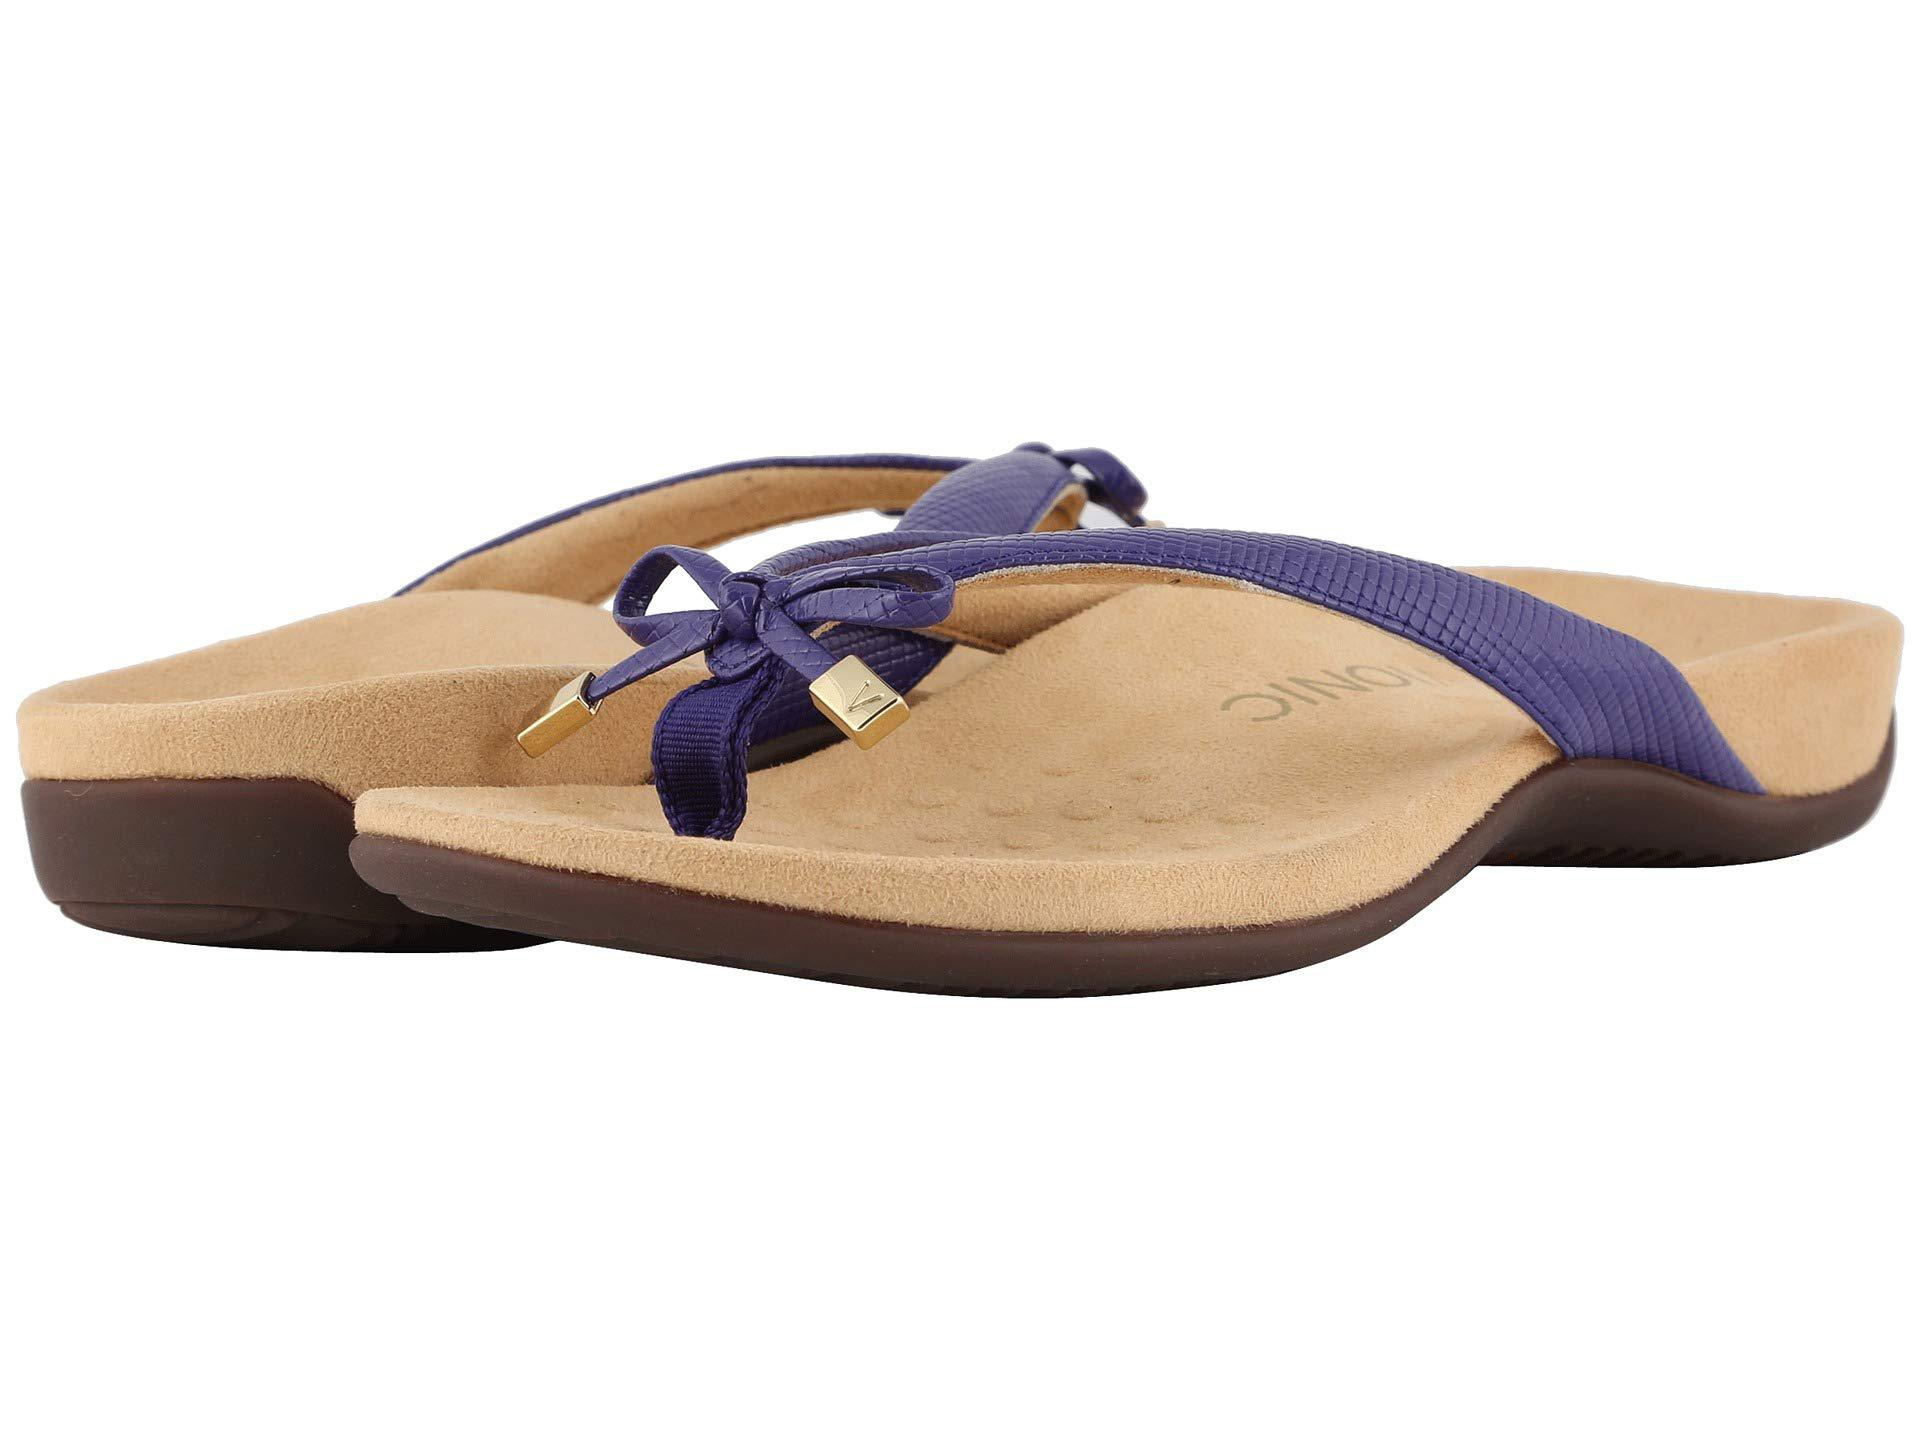 6611cb7ae4c6 Lyst - Vionic Bella Ii Lizard (black) Women s Sandals in Purple